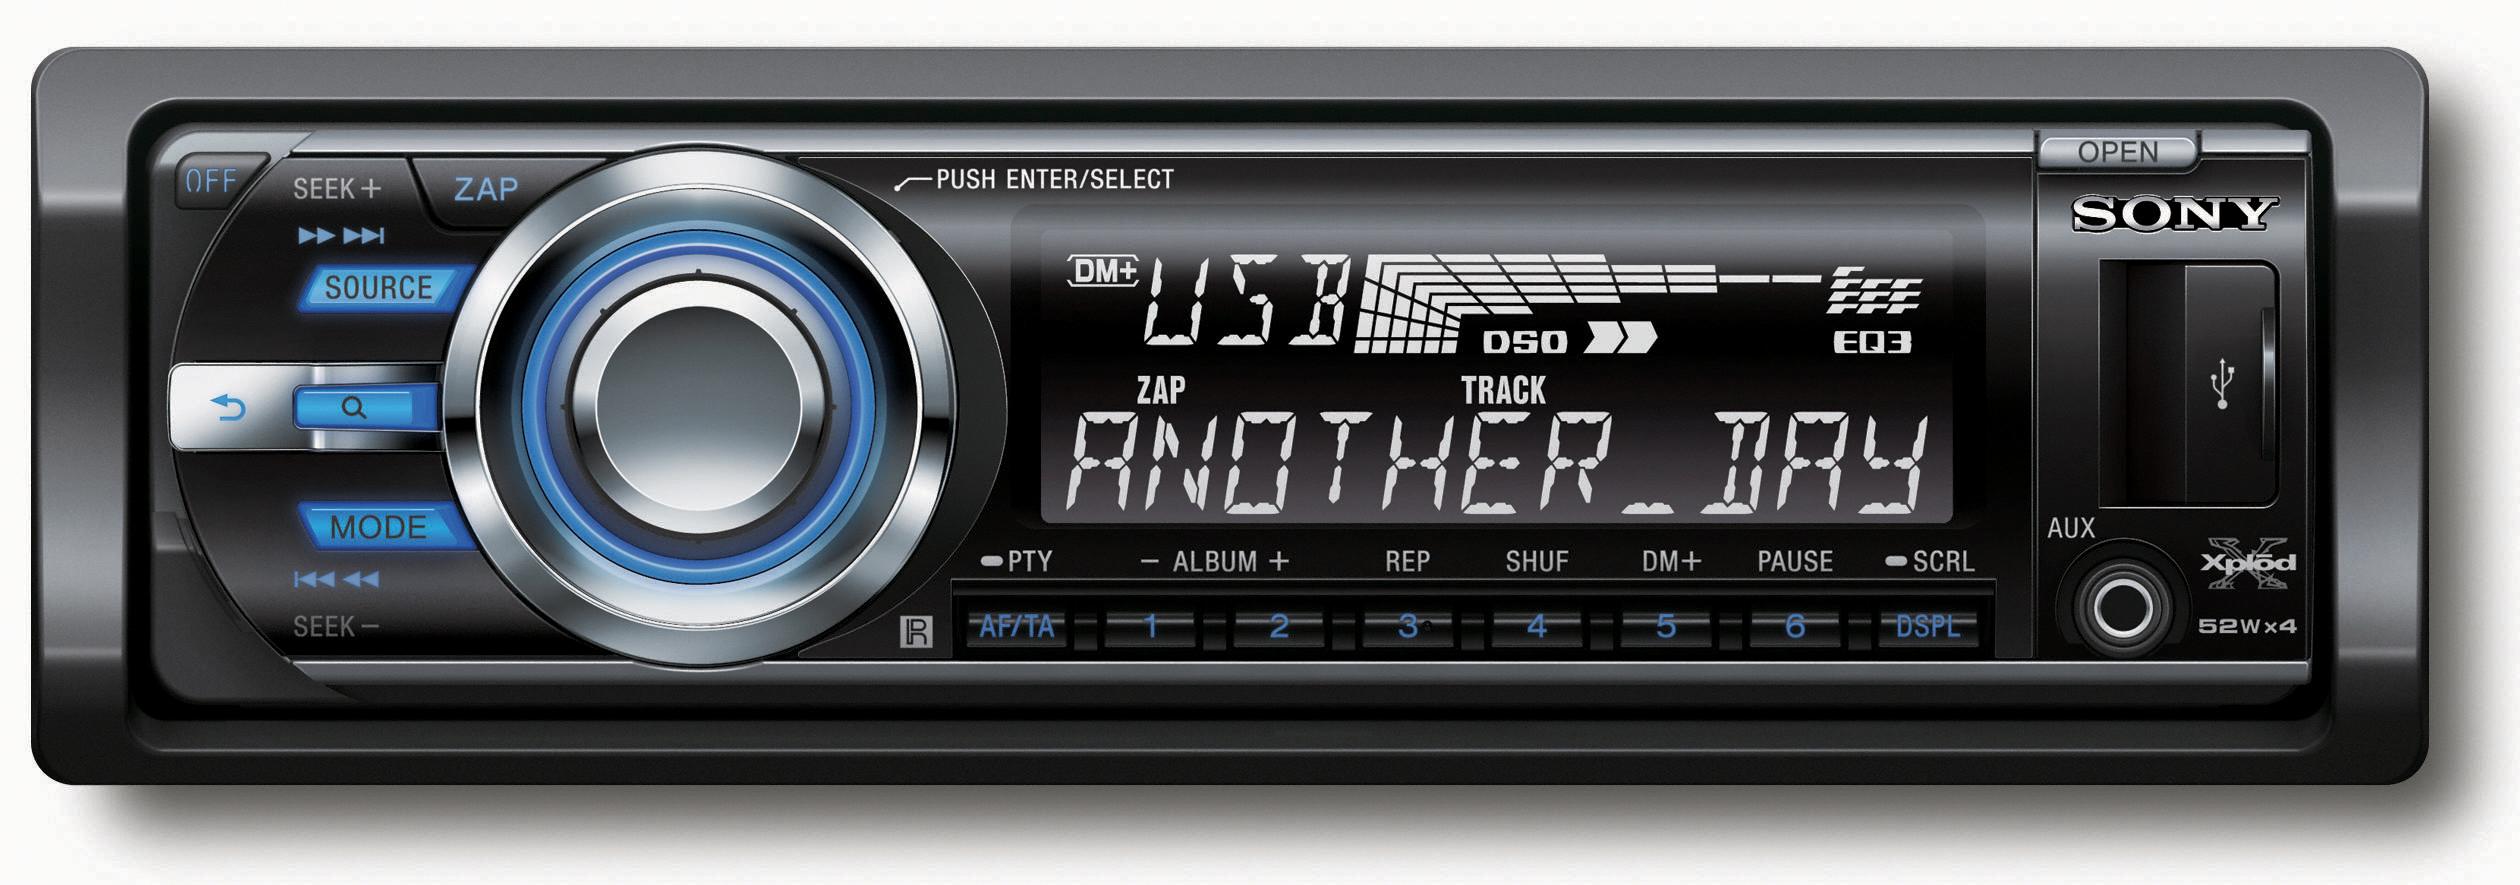 sony car radio wiring diagram rayburn pj for cdx 4000x wire colors